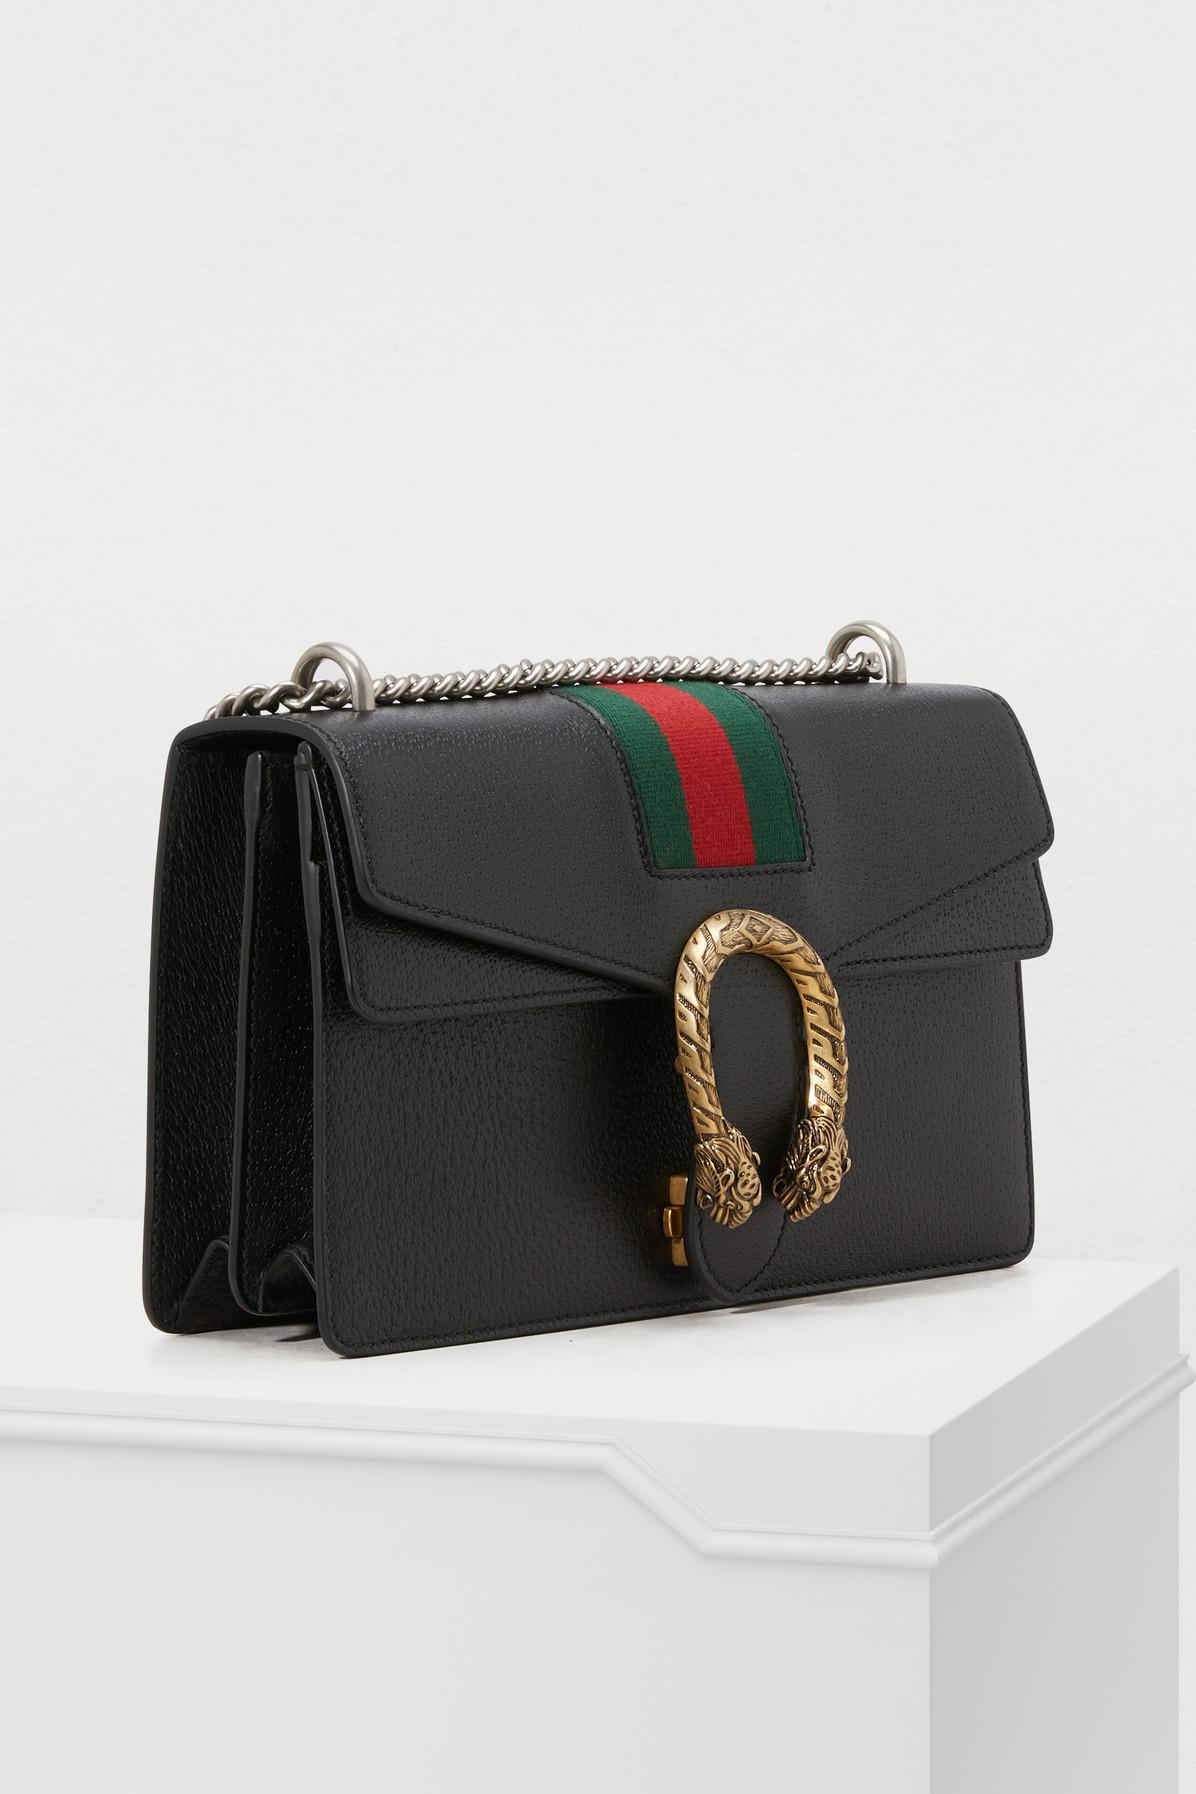 015917ce3cb Gucci - Black Dionysus Leather Shoulder Bag - Lyst. View fullscreen